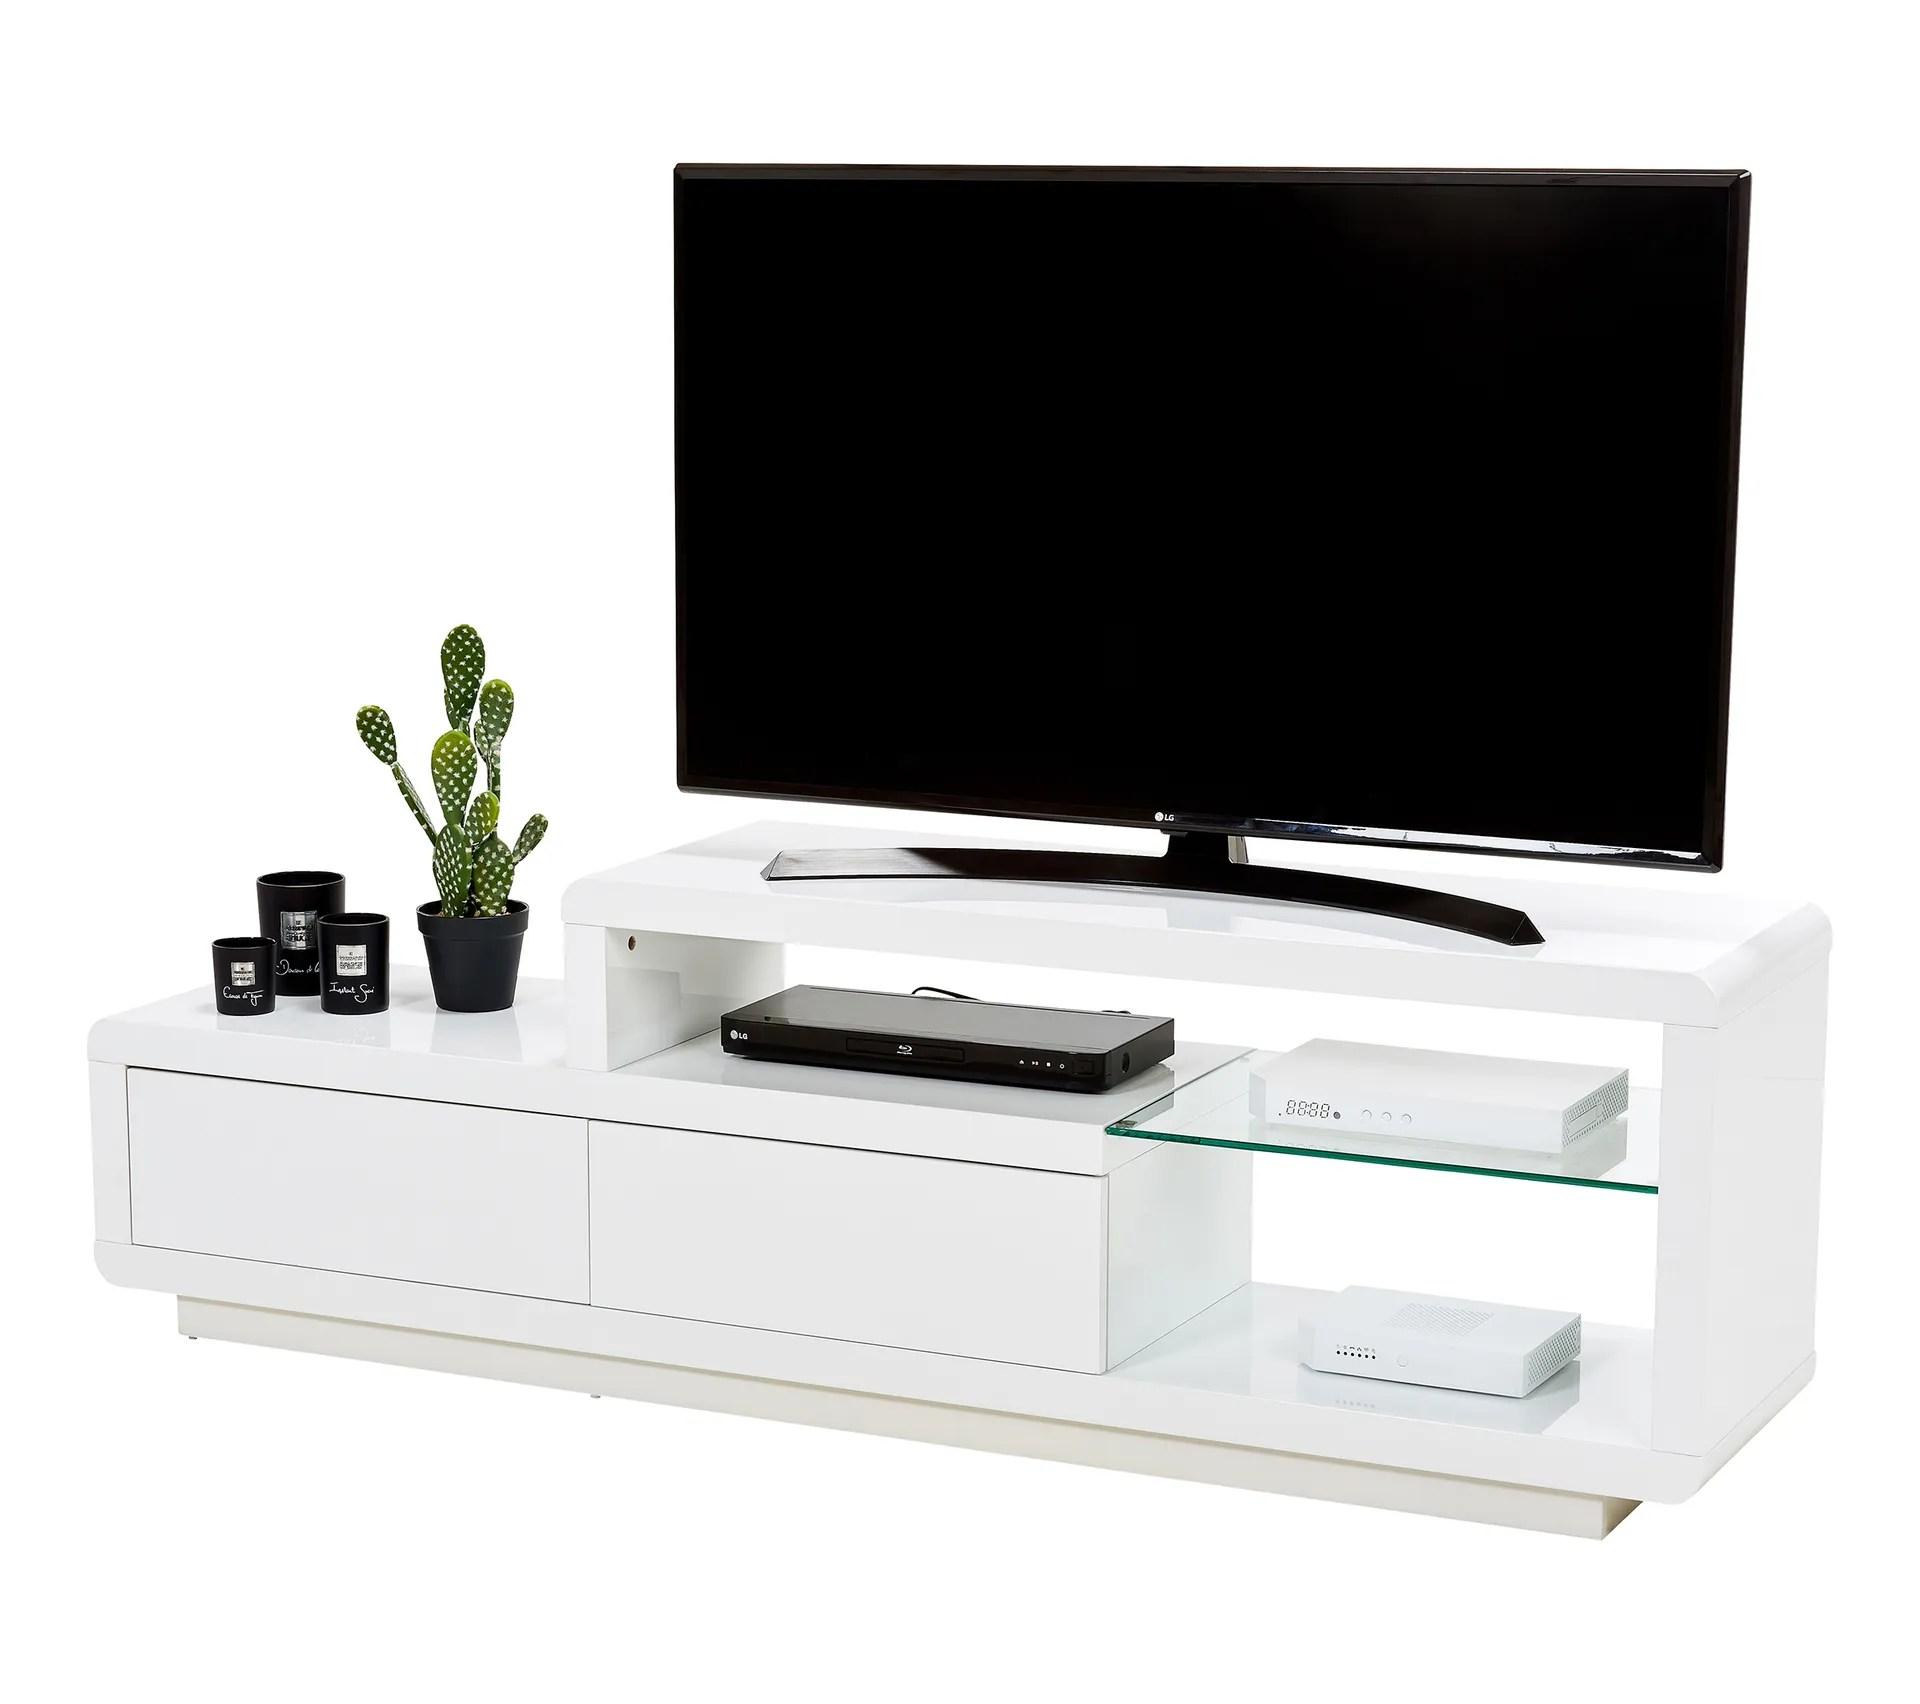 meuble tv samson 2 blanc laque